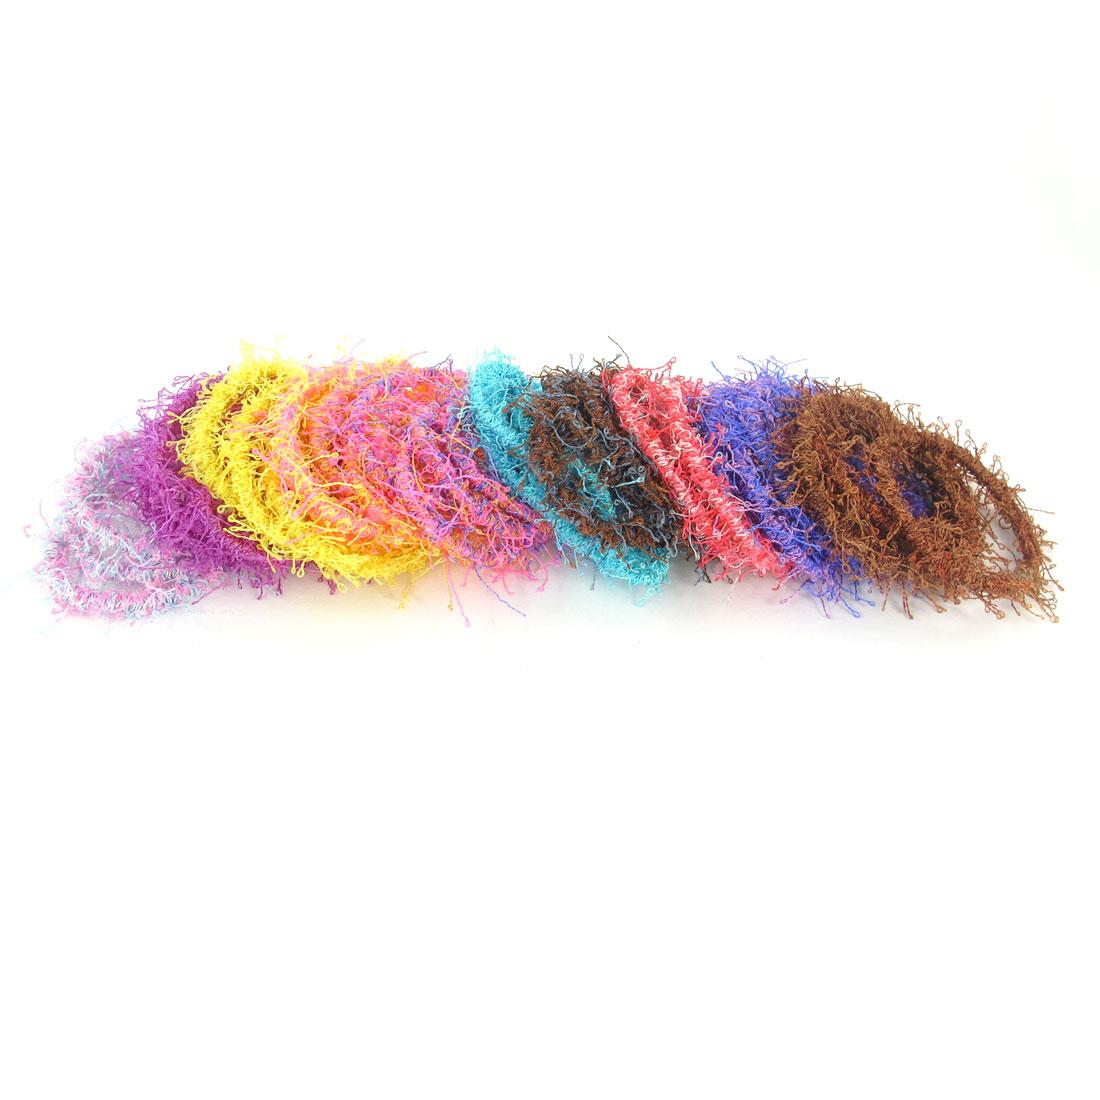 80pcs Assoeted Color Nylon Elastic Rubber Hair Band Ponytail Holder for Girls